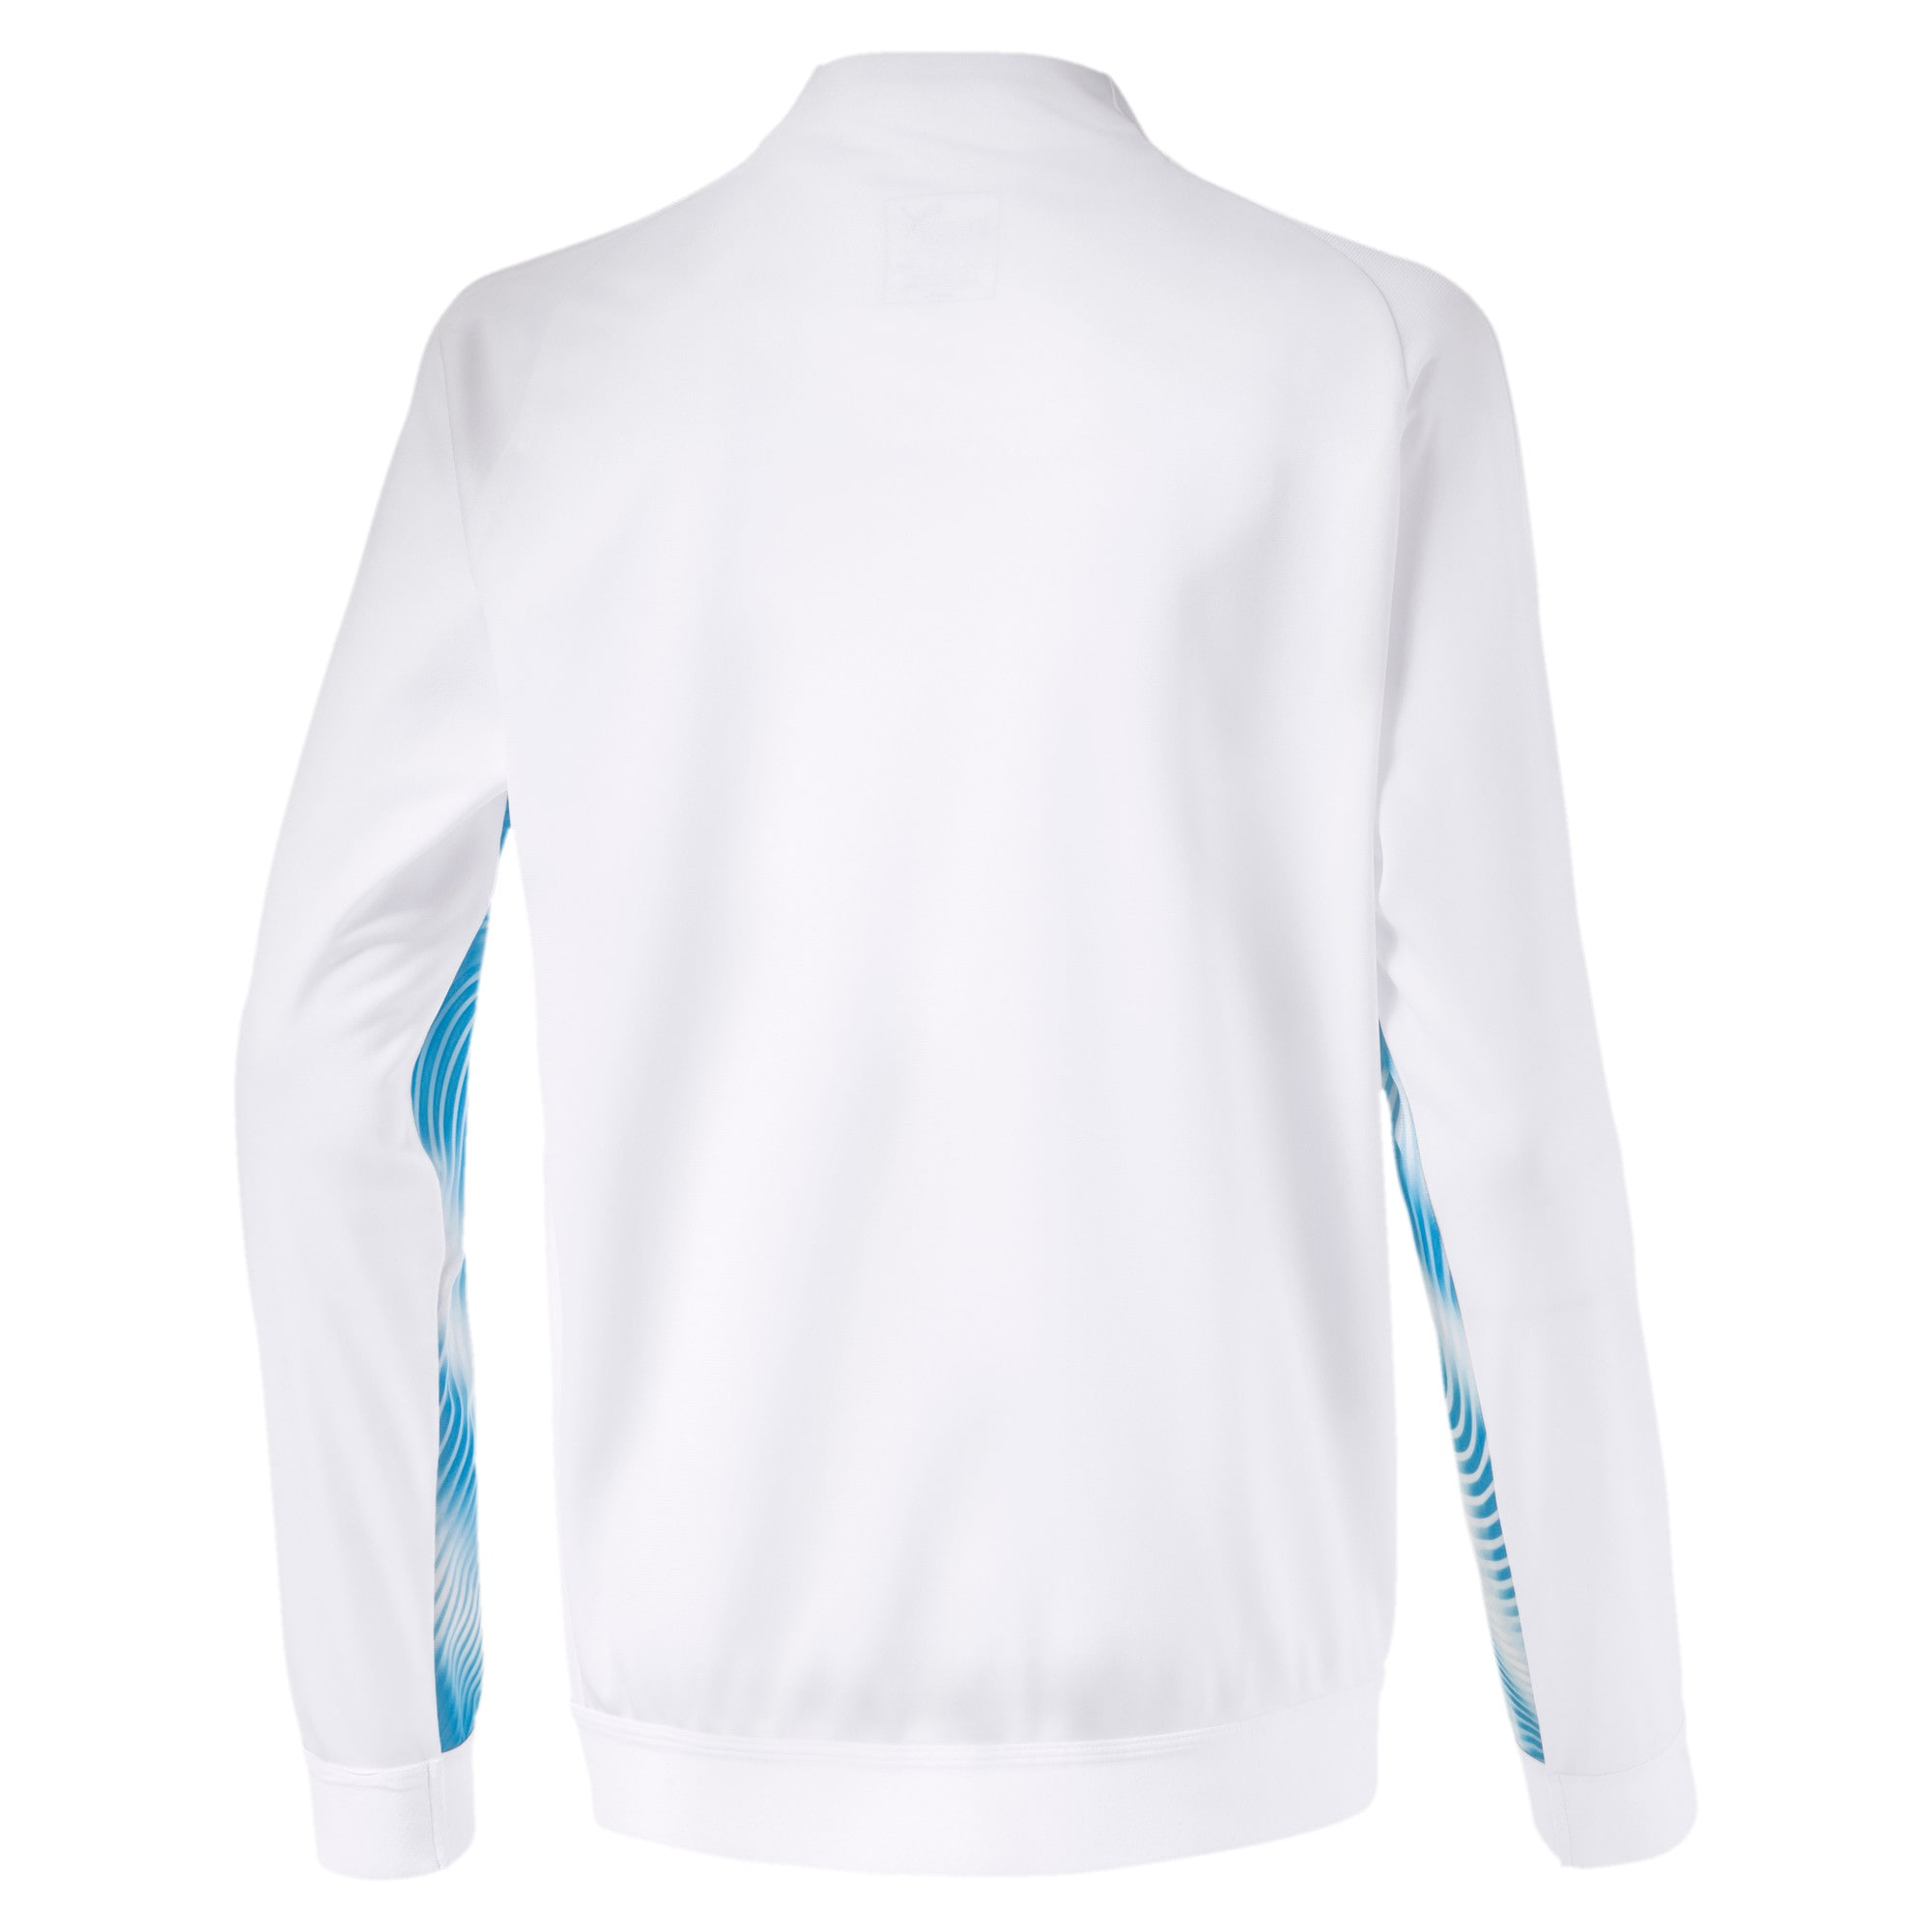 Thumbnail 2 of Olympique de Marseille Stadium Jungen Replica Jacke, Puma White-Bleu Azur, medium